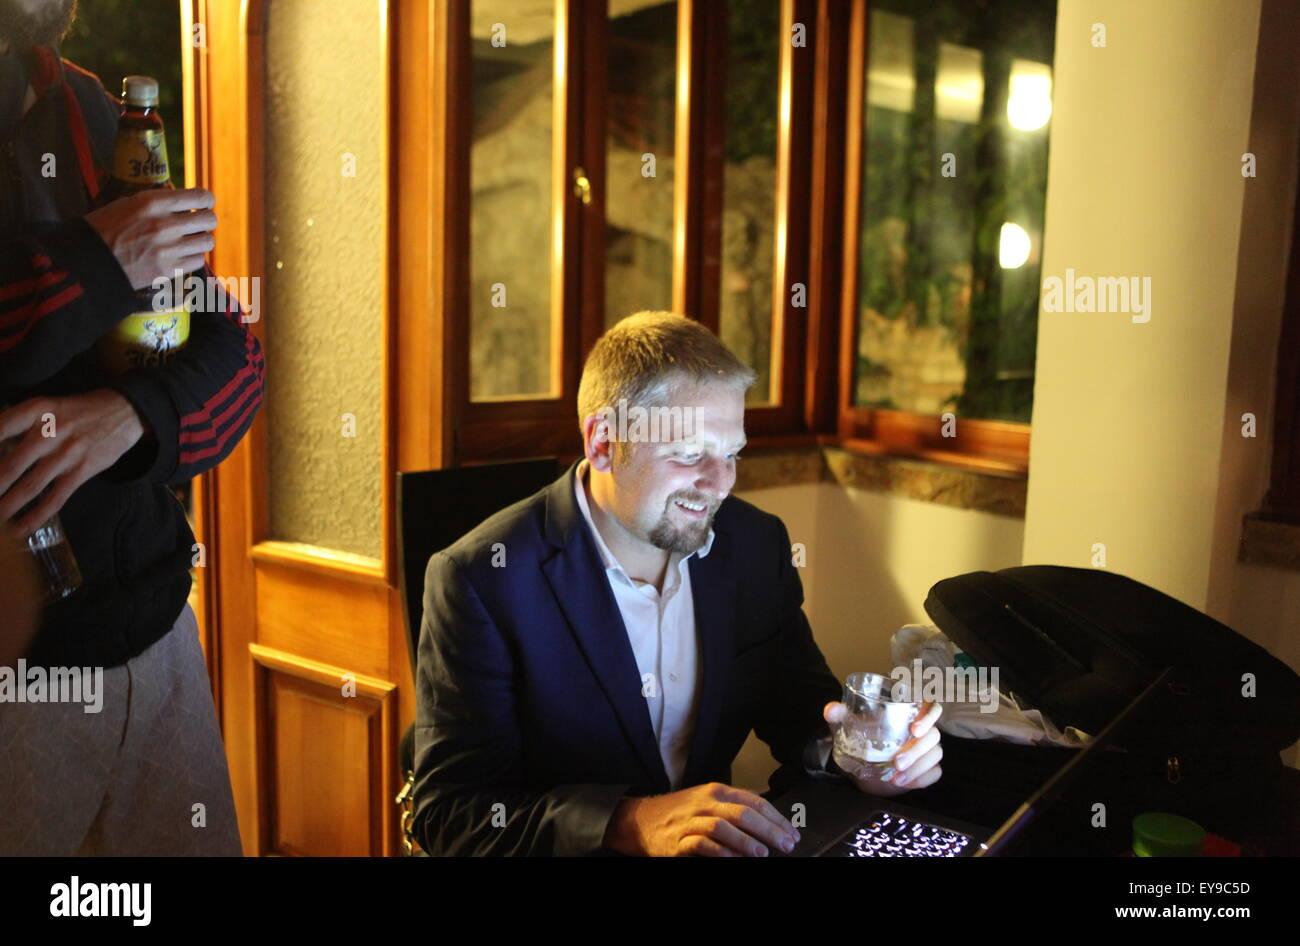 Vit Jedlicka is listening to Liberland future national anthem - Stock Image